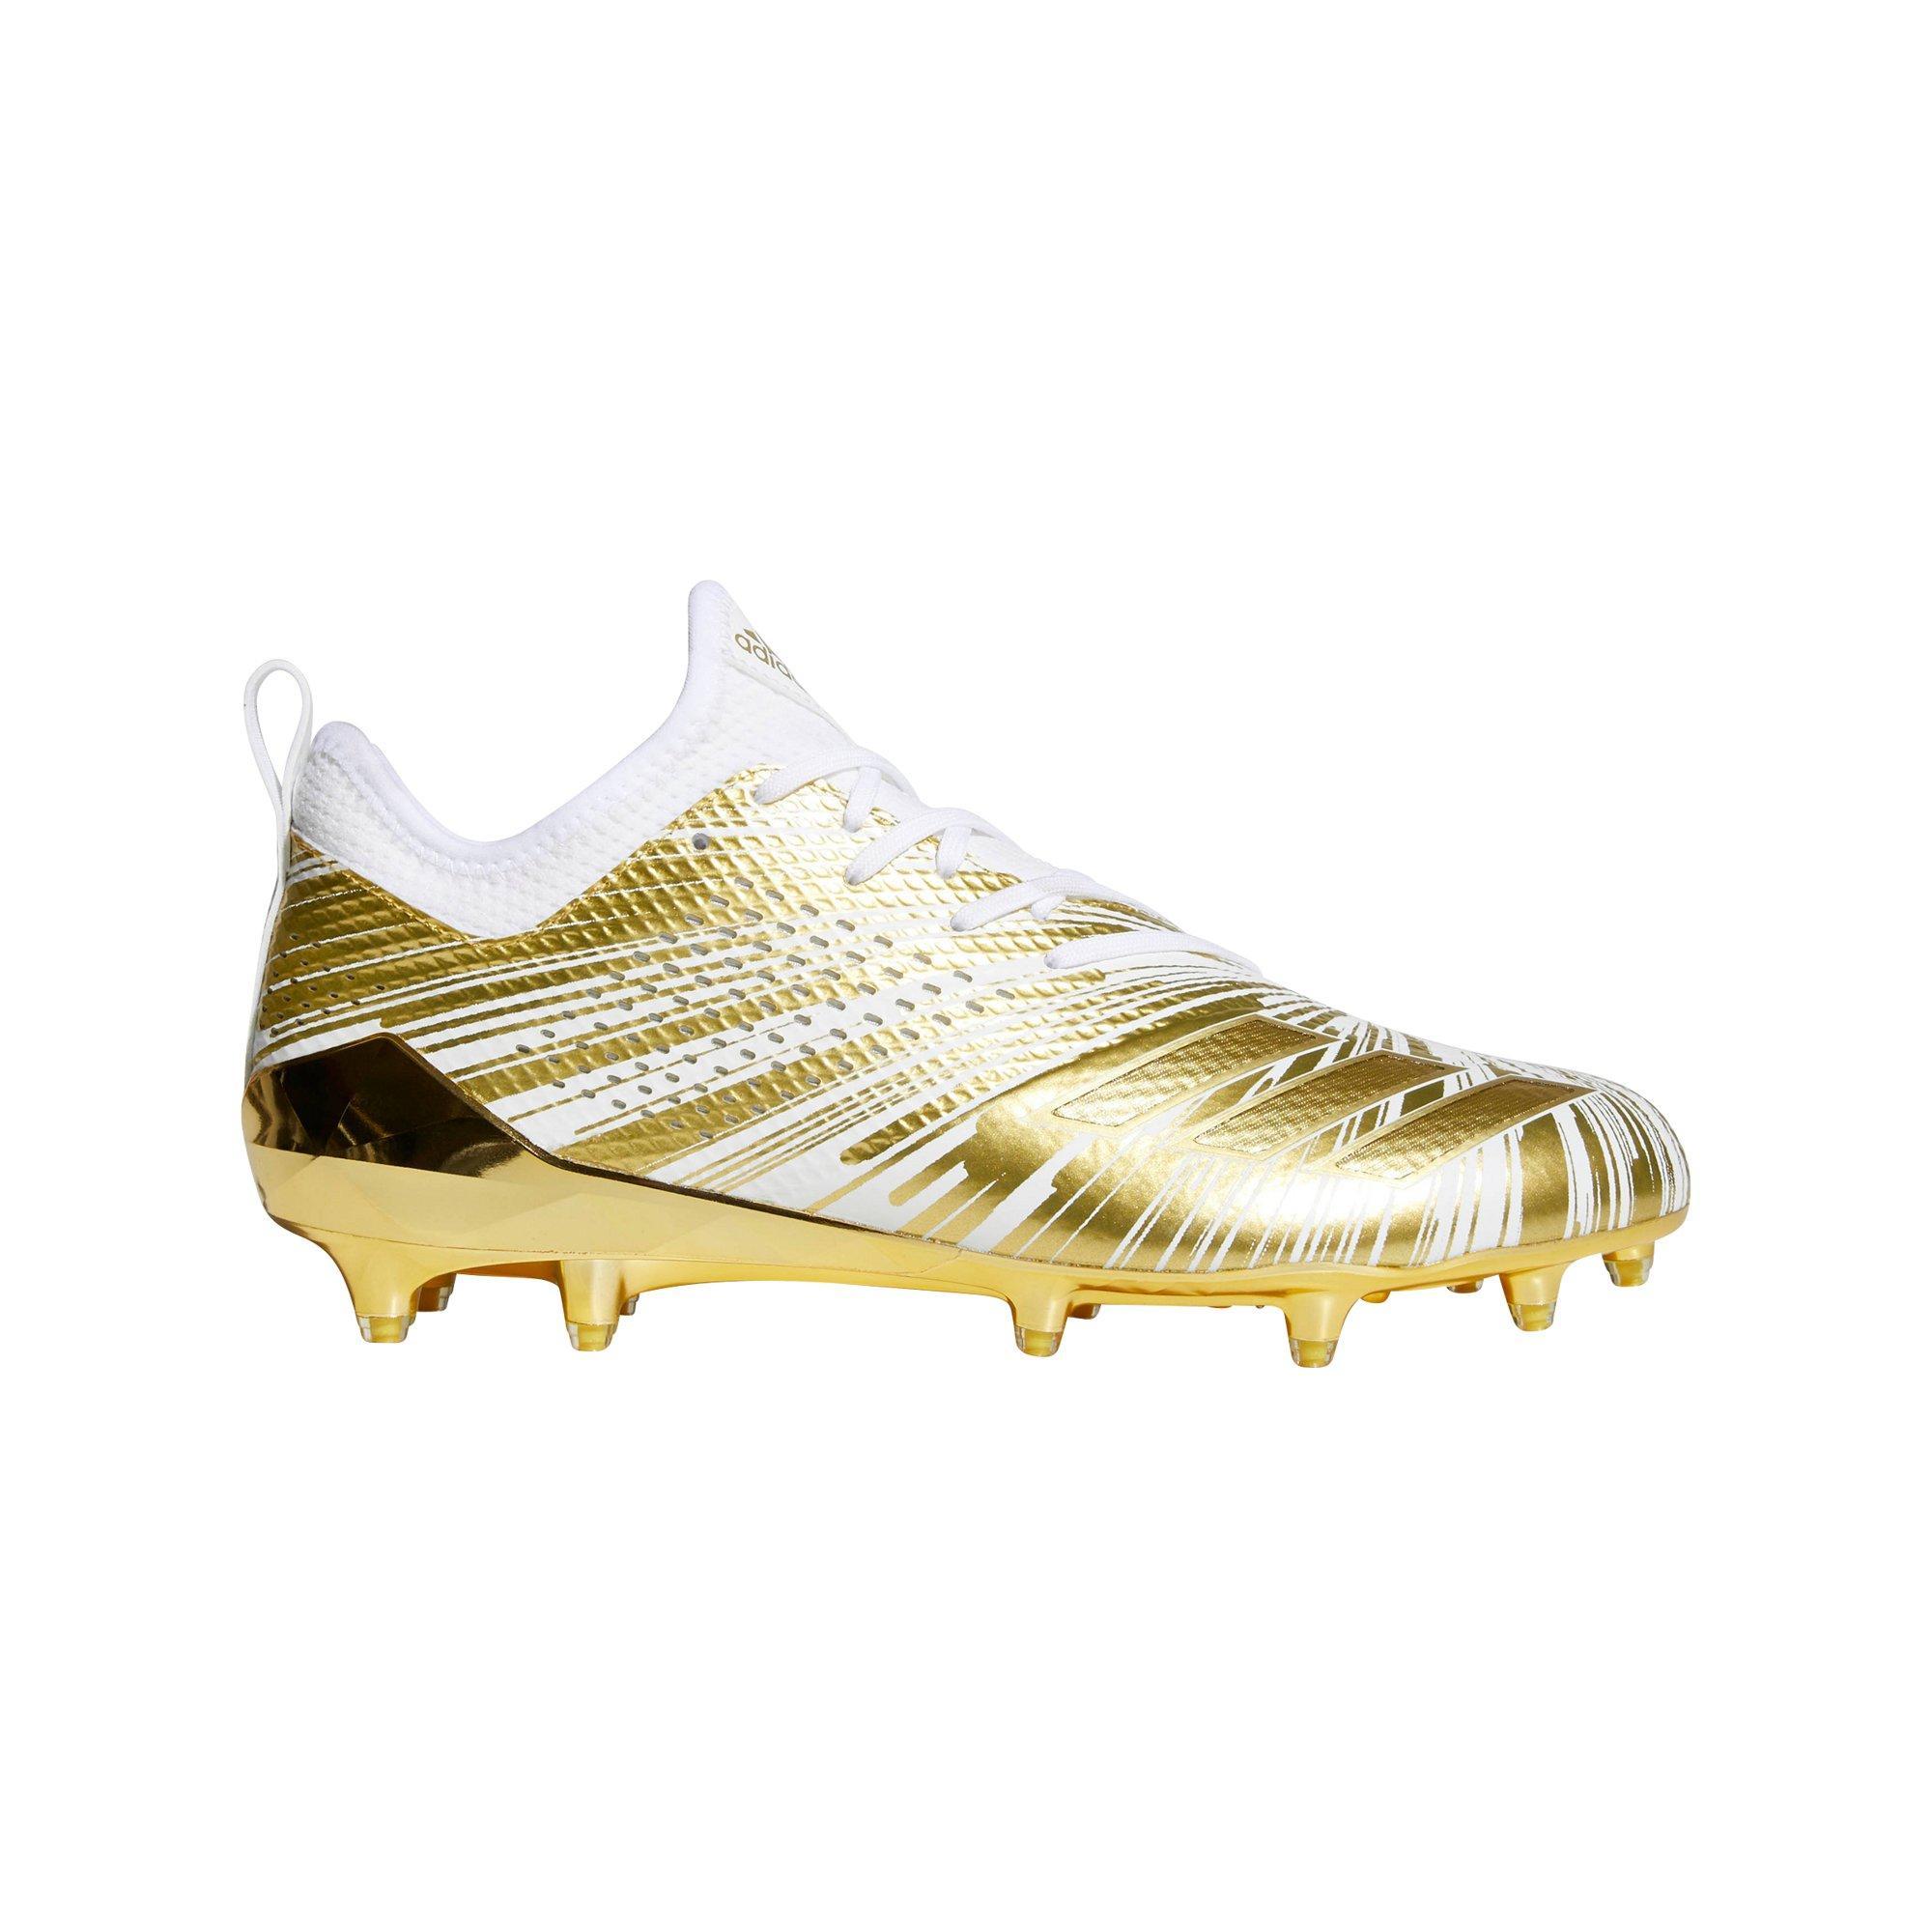 b6a7fe33357d adidas football cleats gold aujourd hui meilleures offres www ...